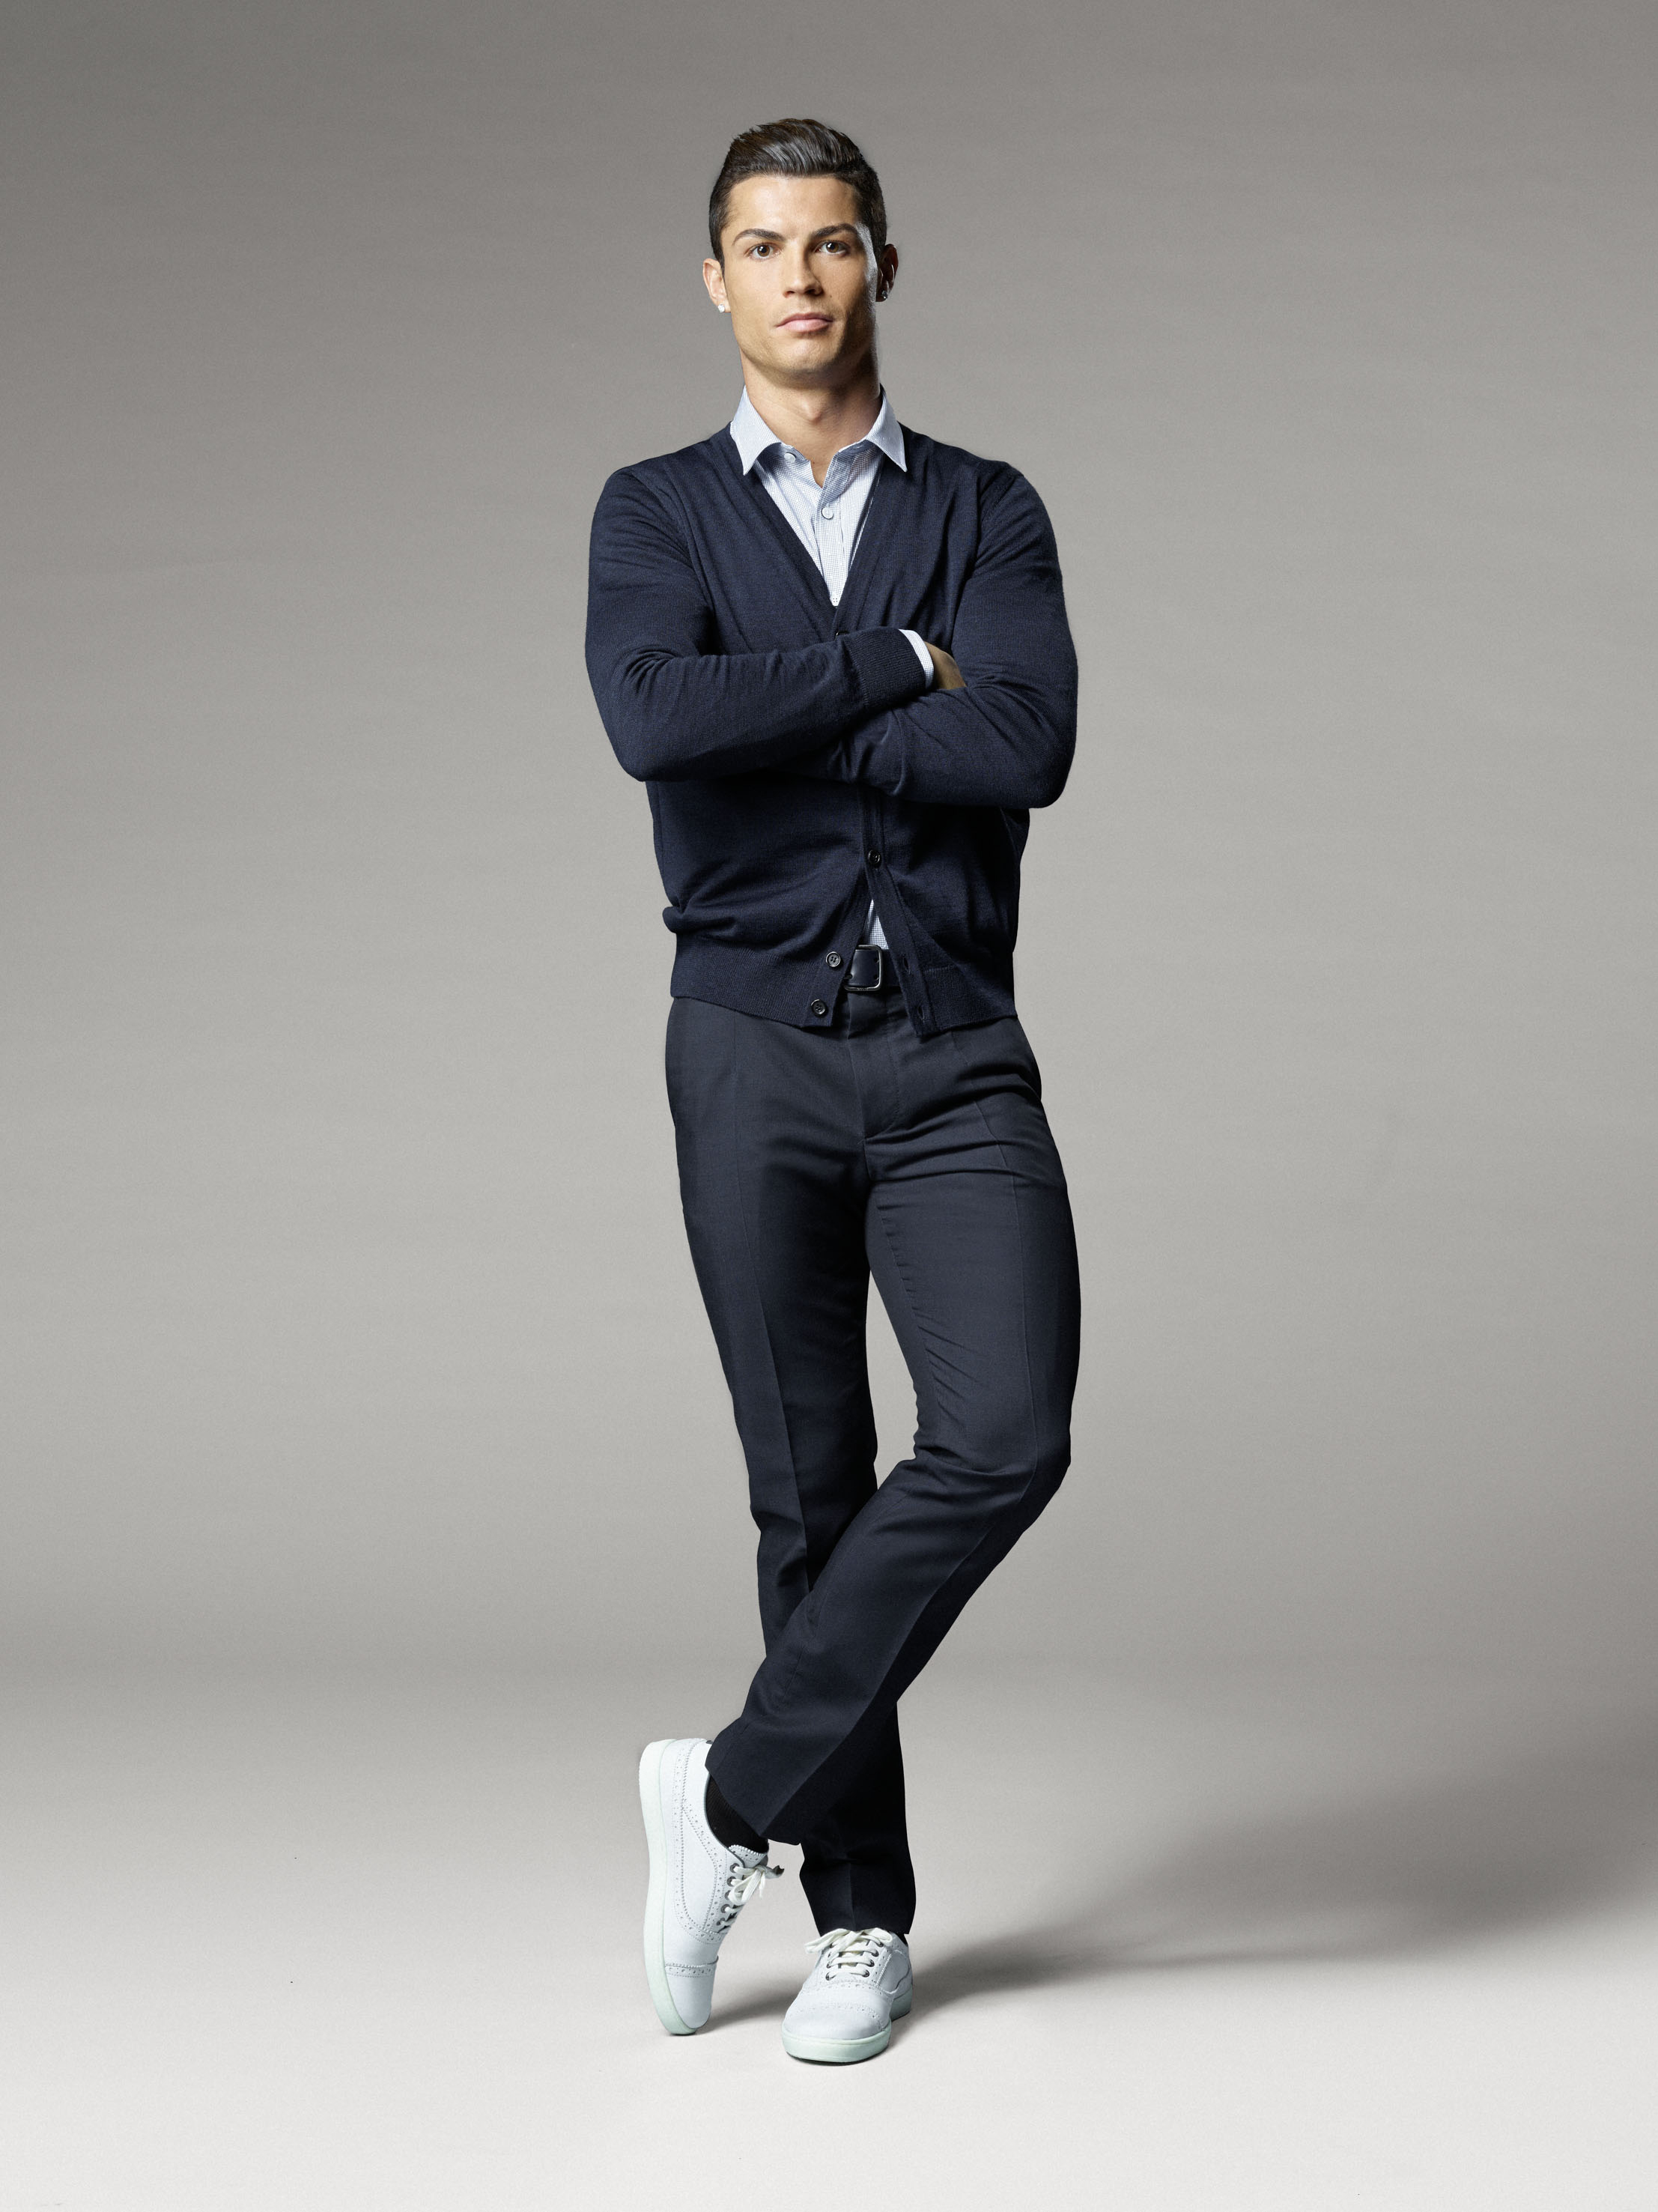 Chaussure De Foot De Cristiano Ronaldo 2015